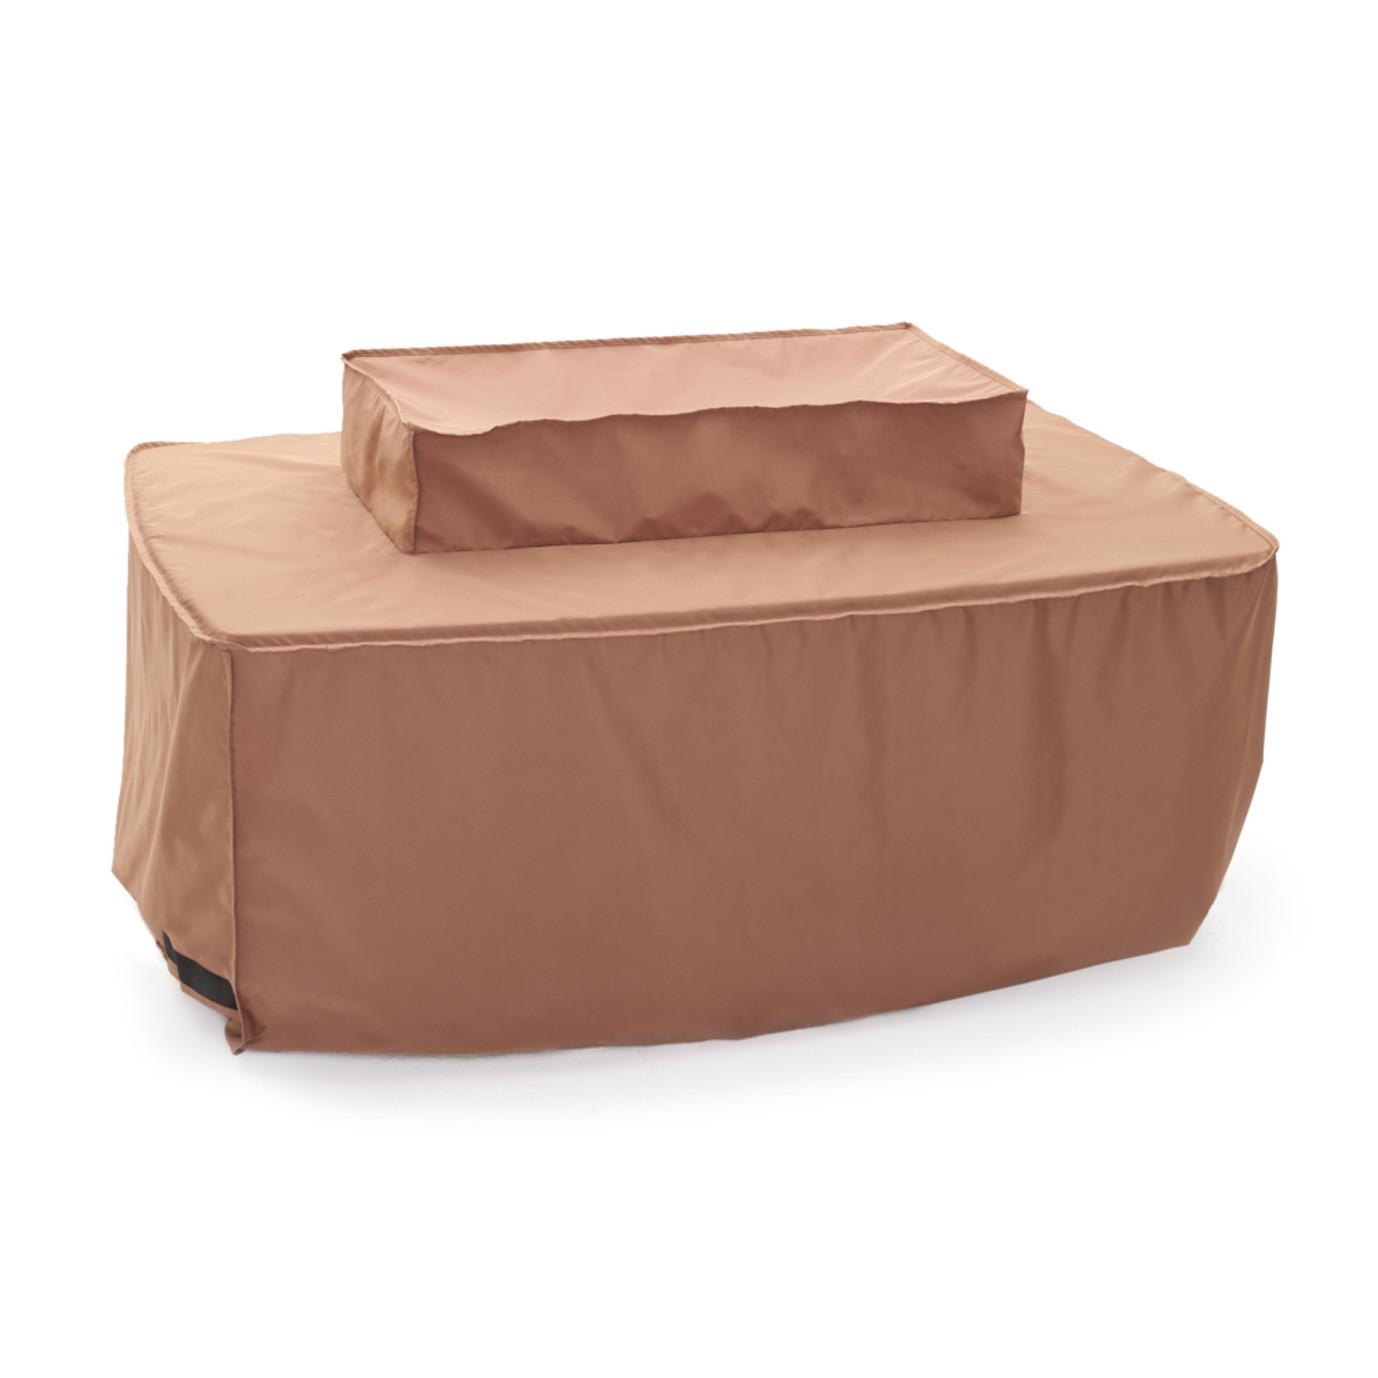 Vistano 40x61 Fire Table Furniture Cover